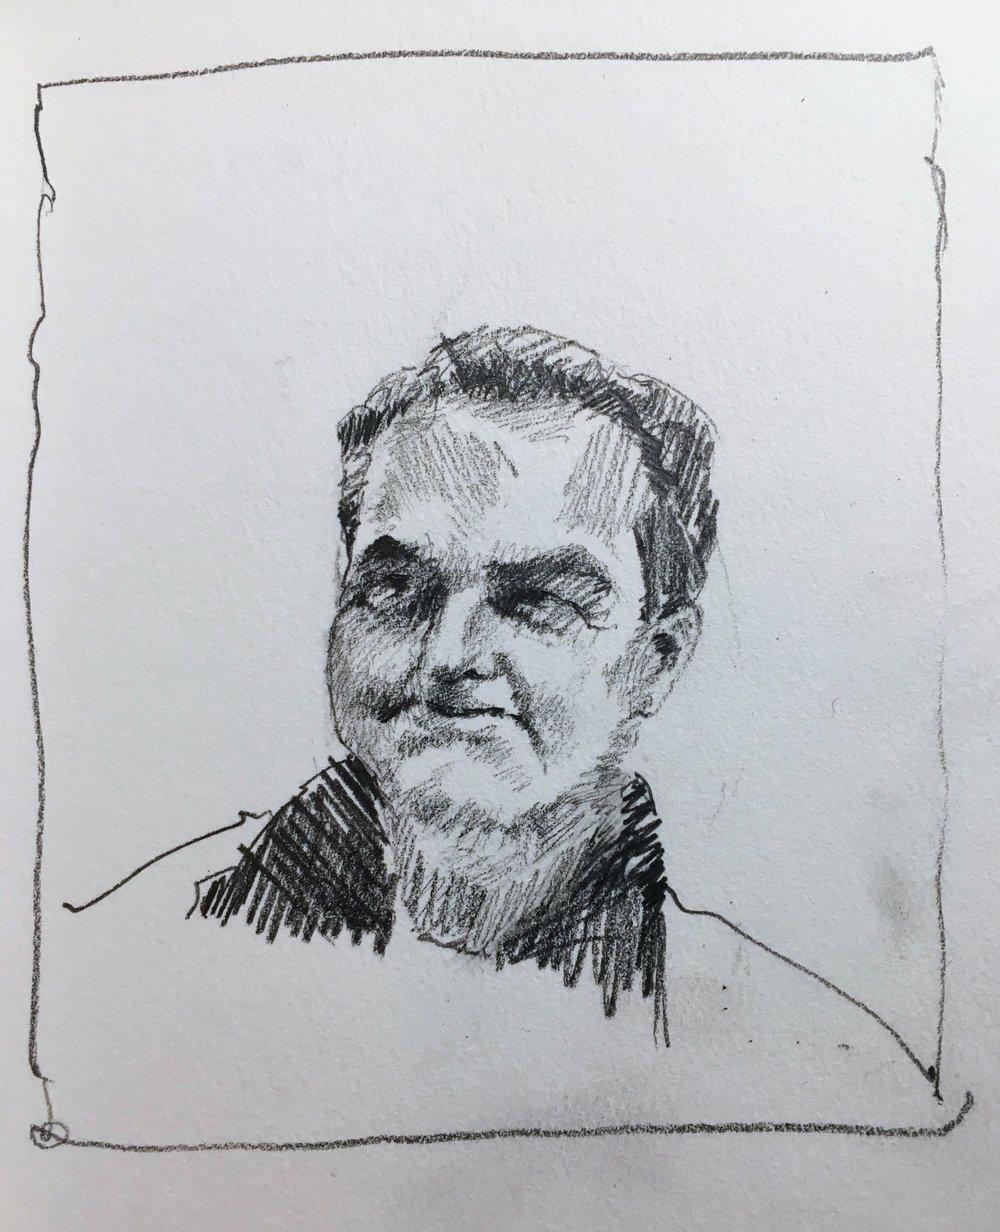 zbukvic_portrait_sketch.JPG